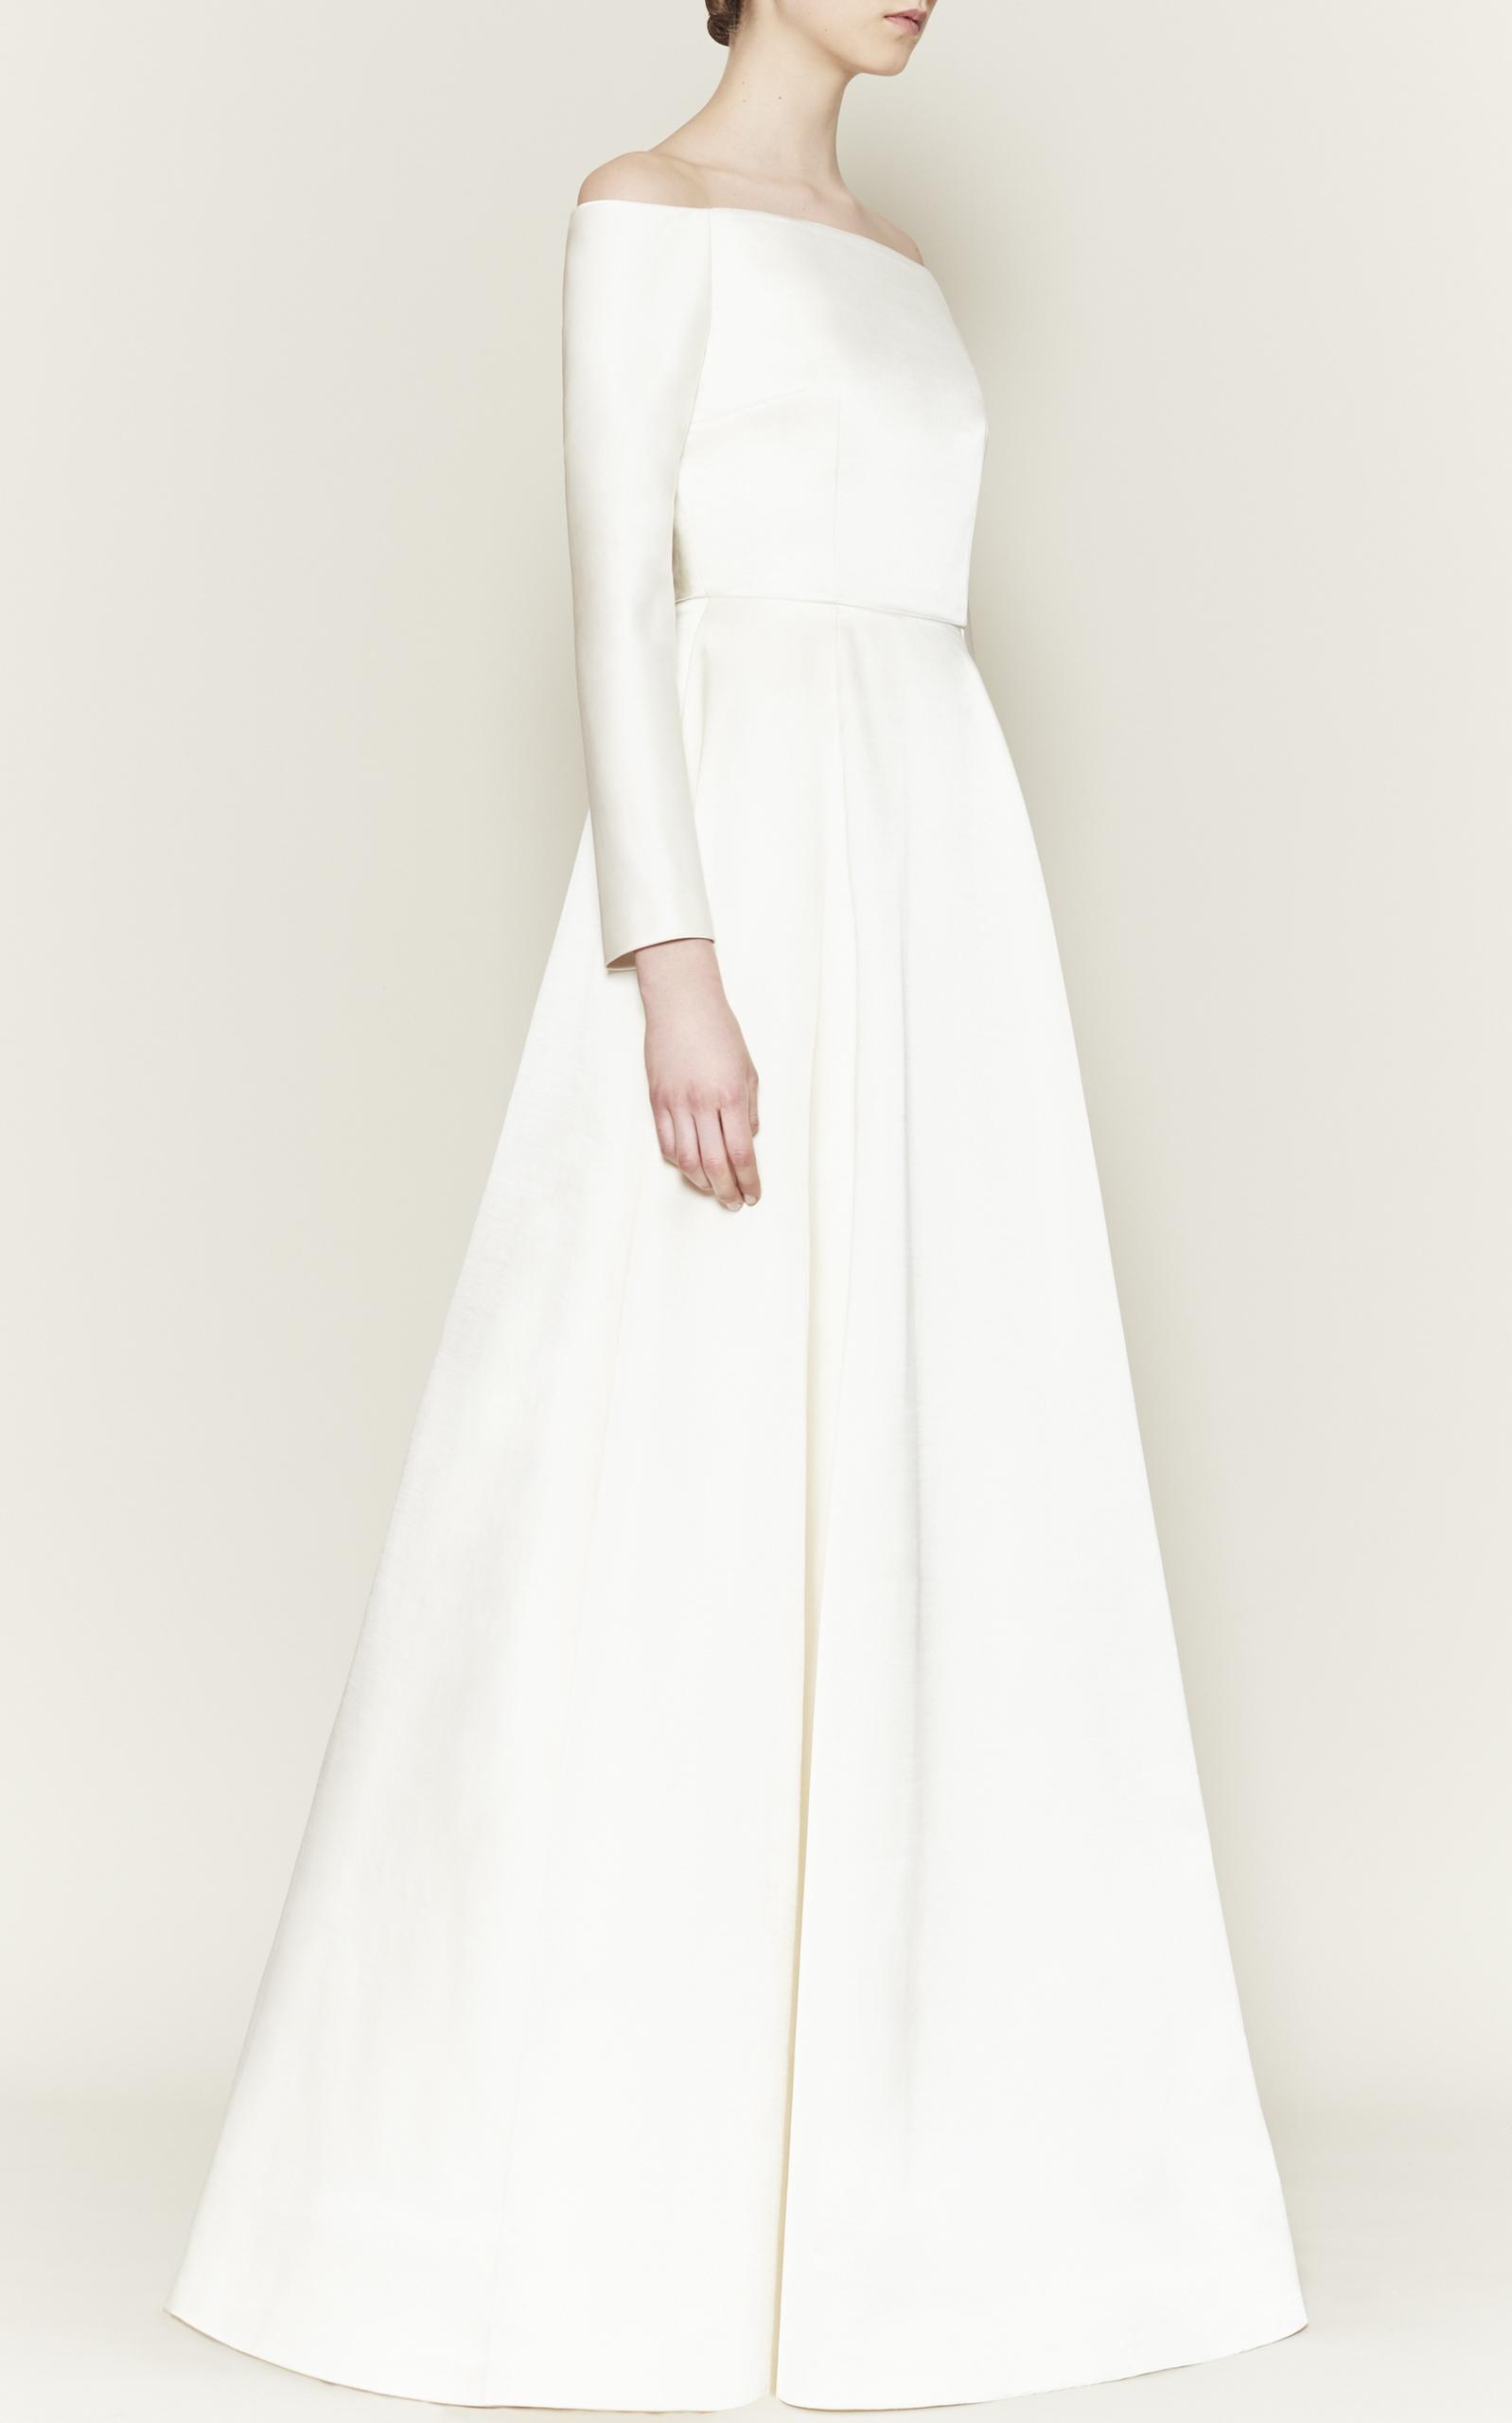 Emilia Wickstead Bridal Trunkshow | Moda Operandi